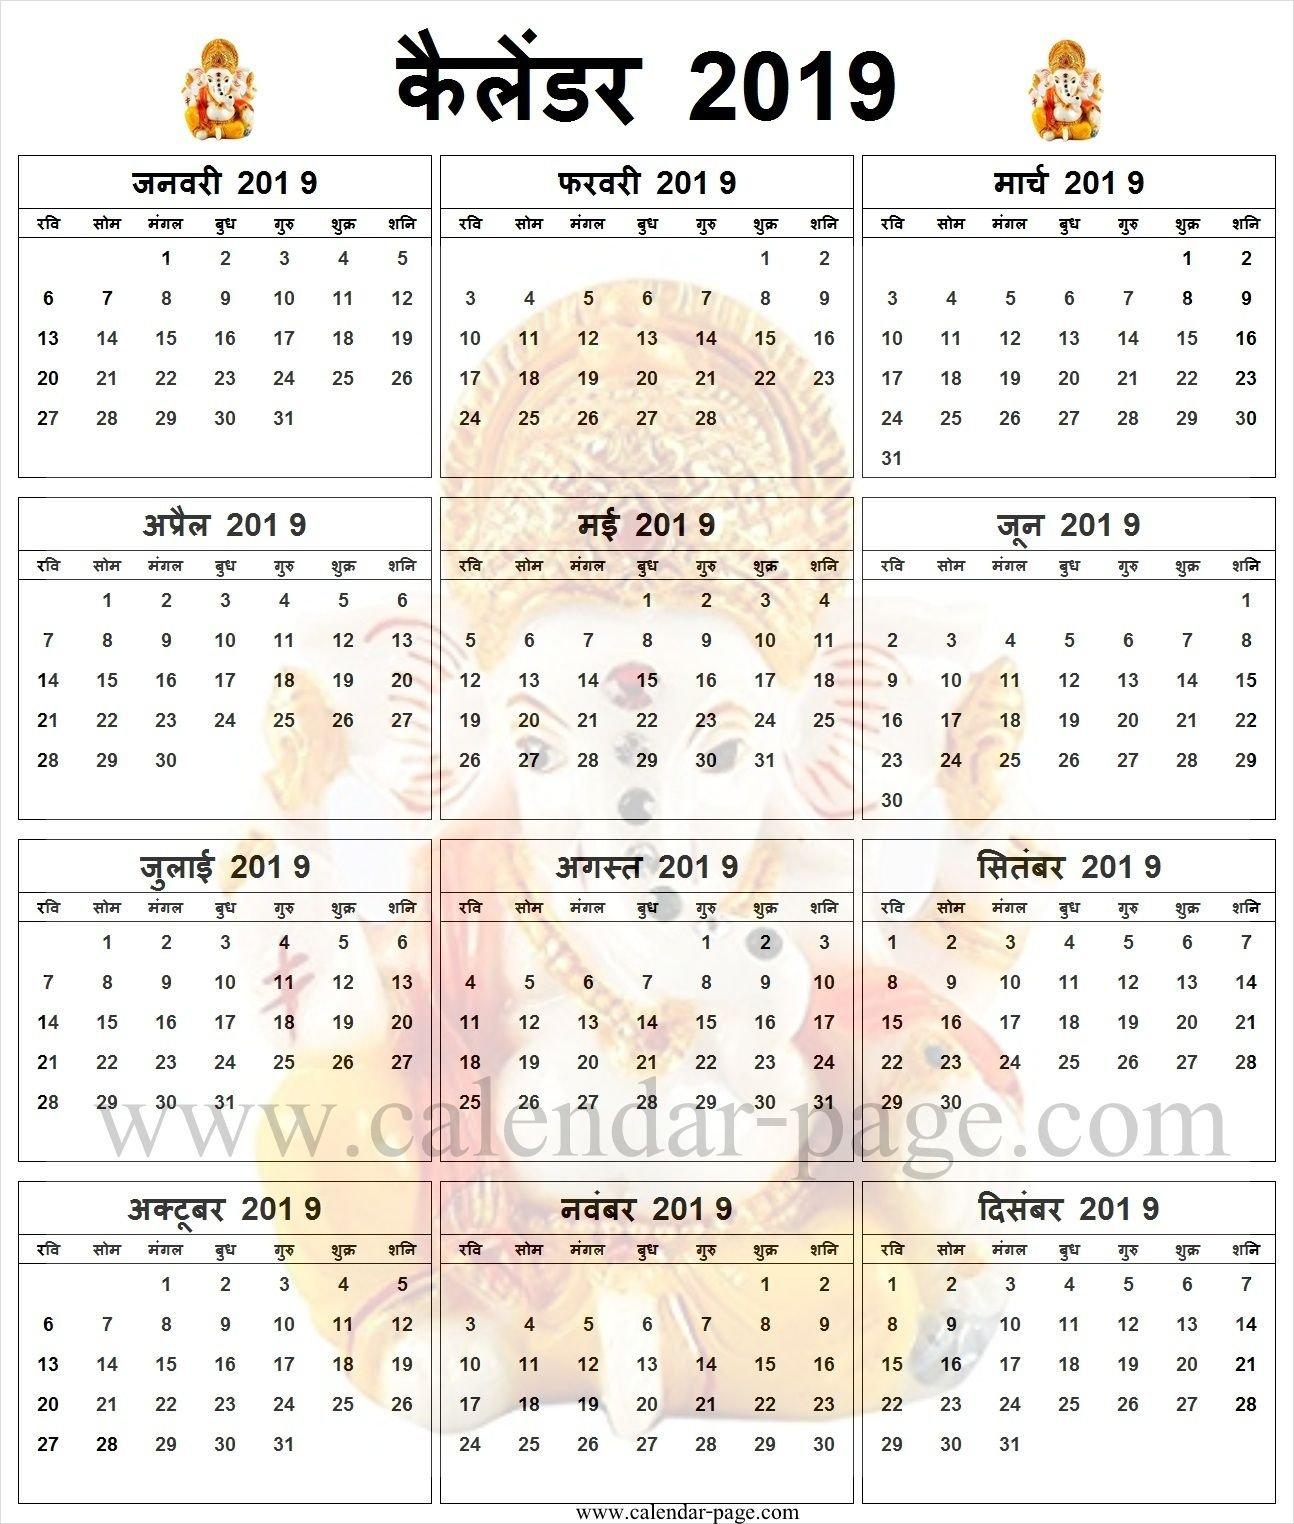 Hindi 2019 Calendar   Calendar 2019 Yearly Template   Free Calendar Calendar 2019 Hindi